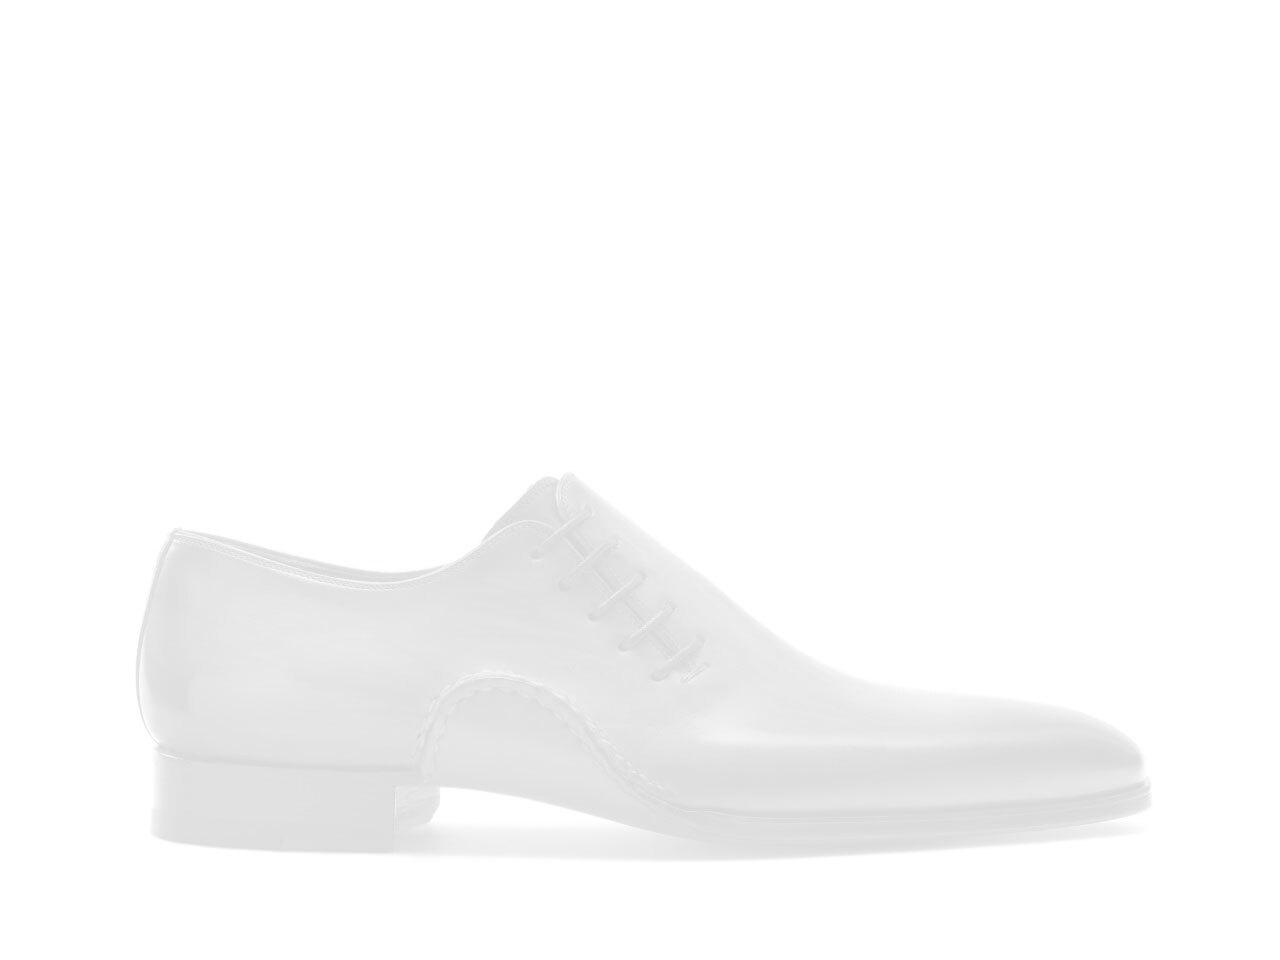 Magnanni Casual Dress Sock Midnight Men's Casual Socks